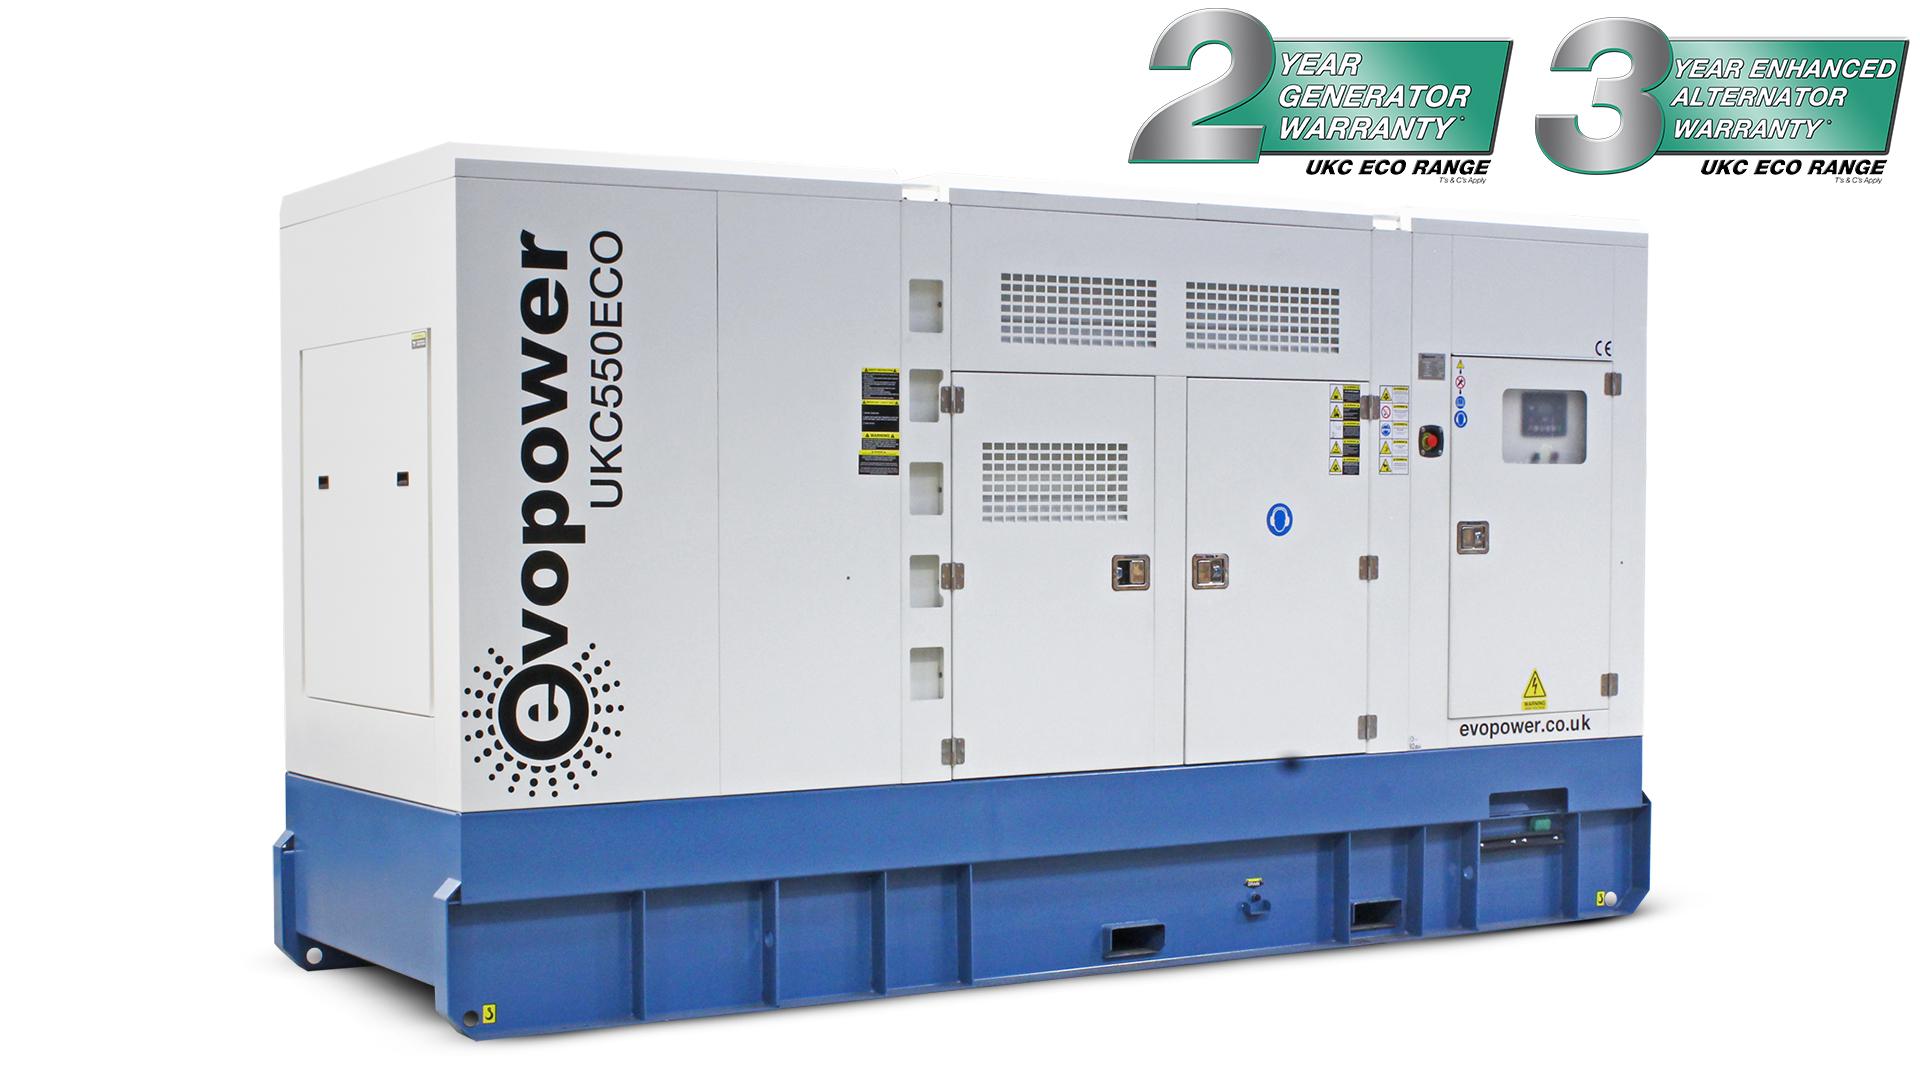 UKC550ECO 550kVA Diesel Generator Main Image